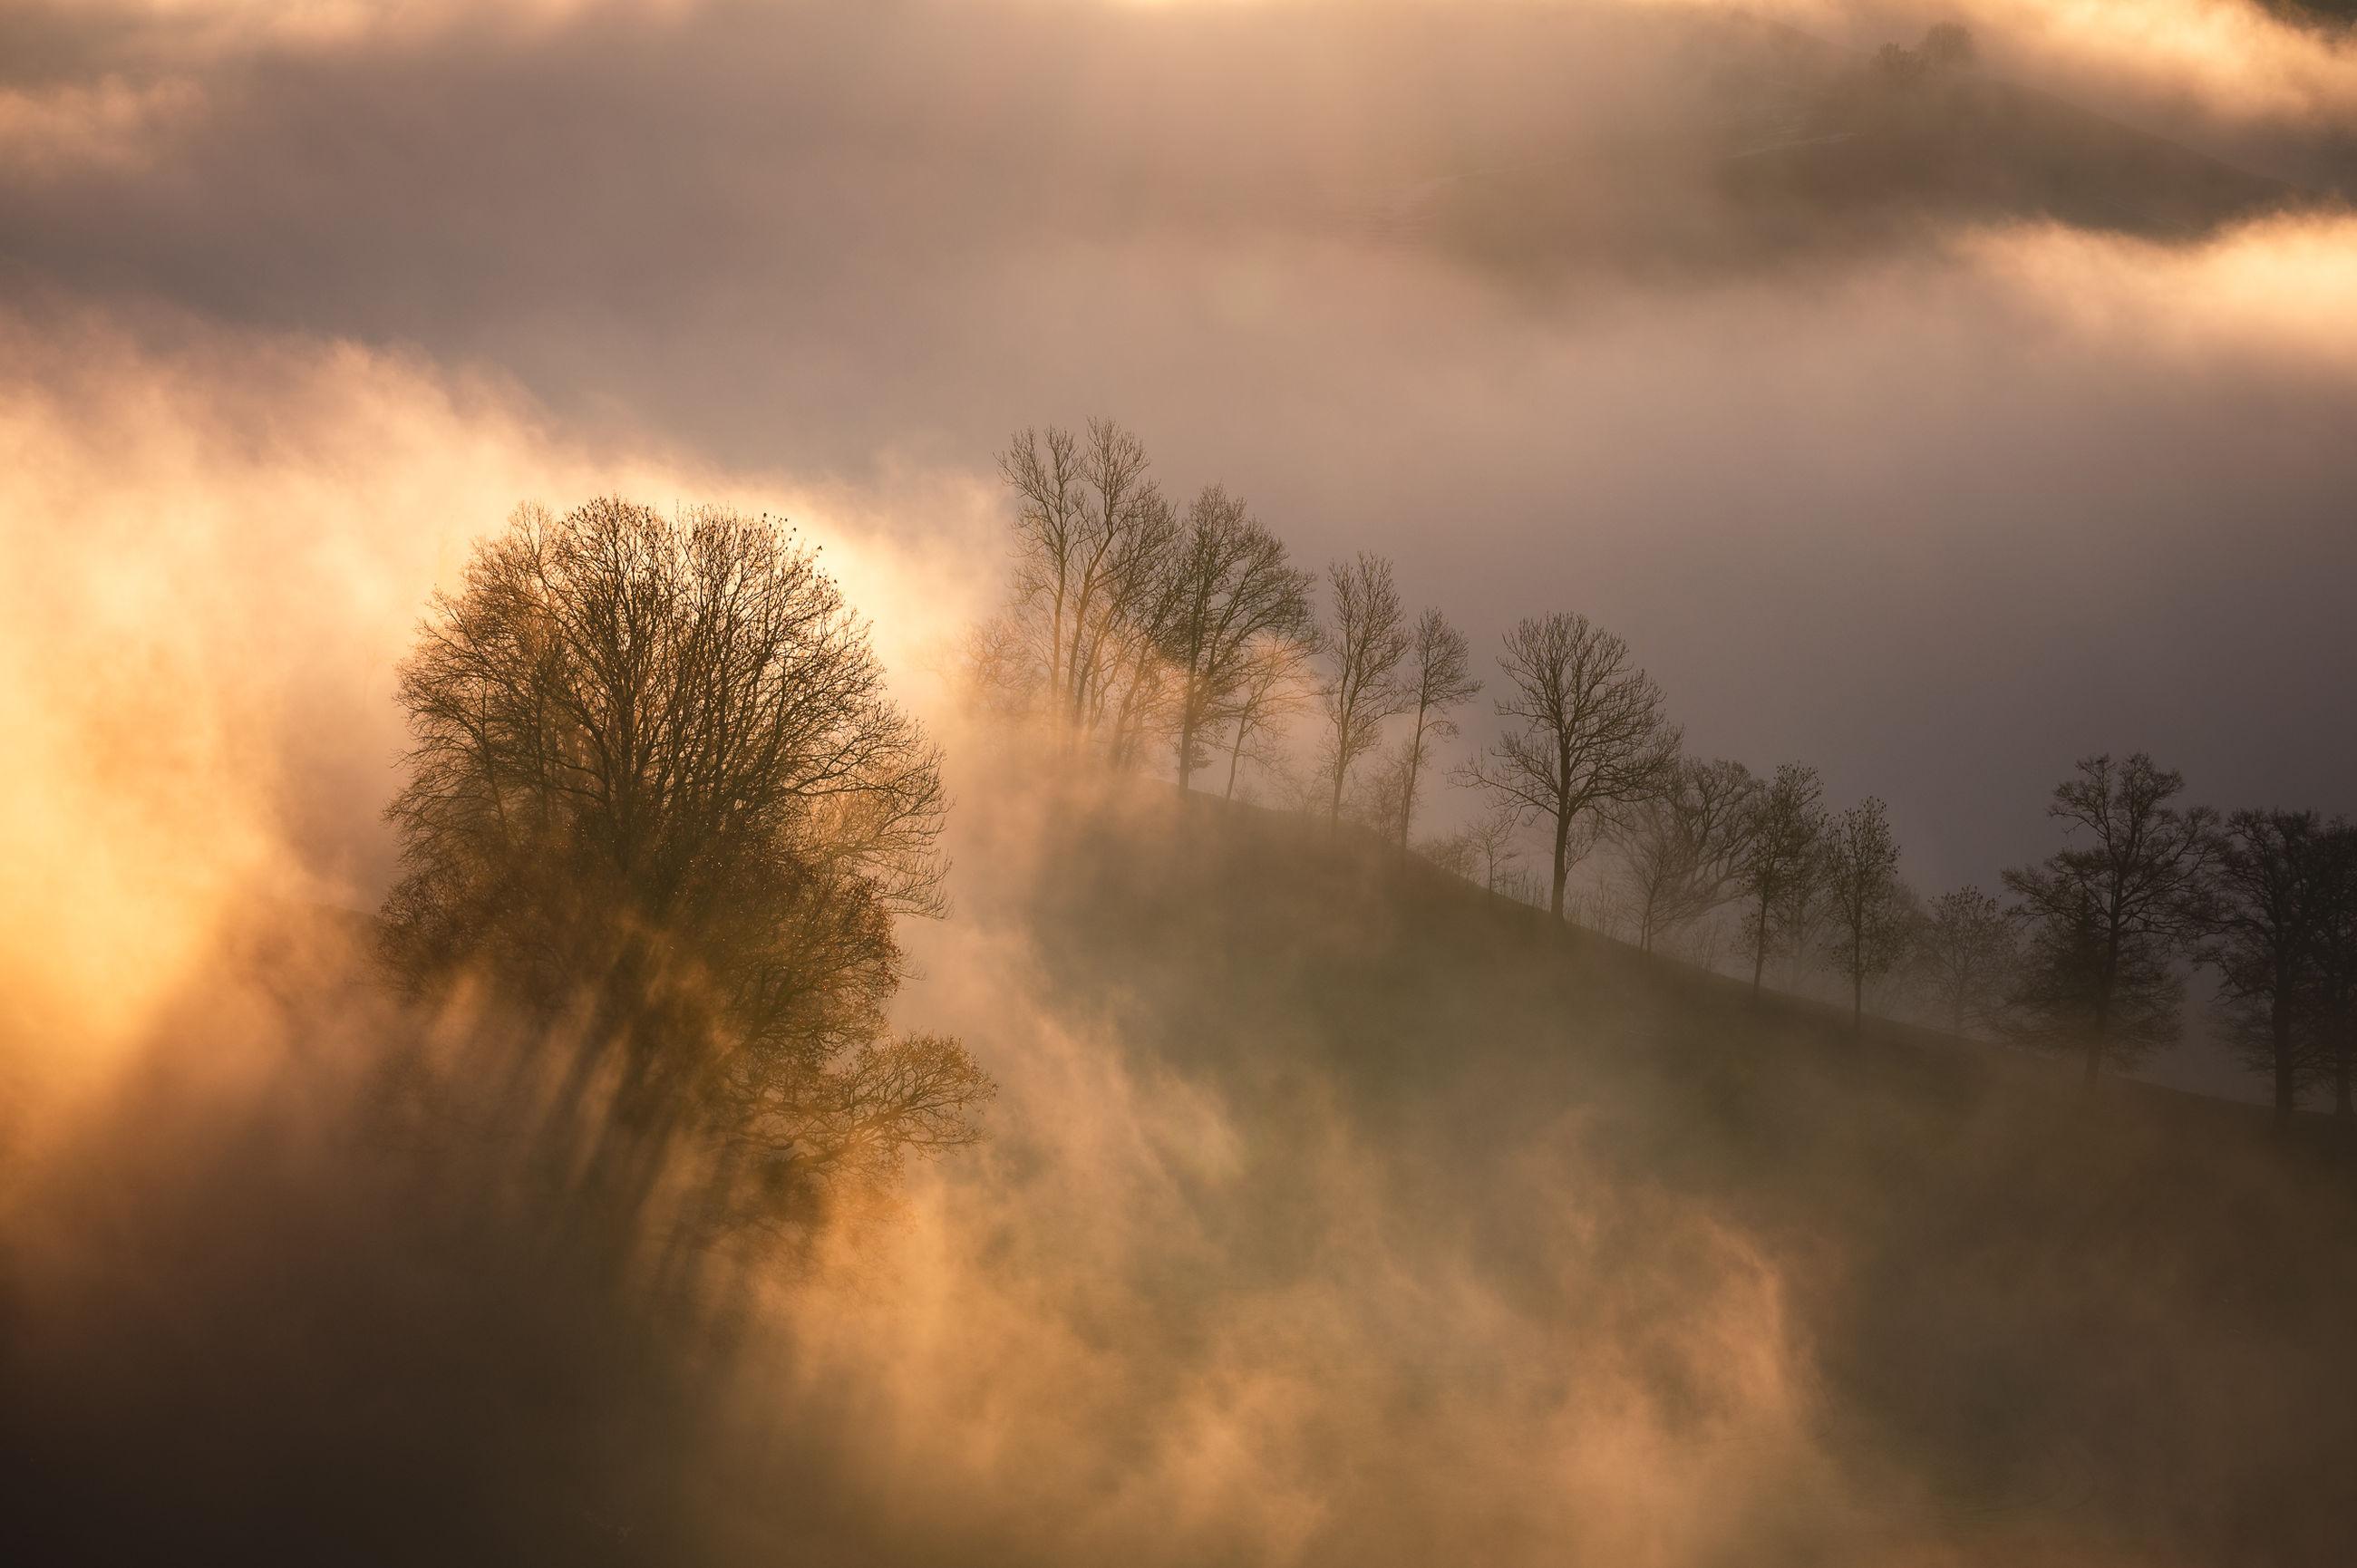 mist, tree, morning, cloud, fog, environment, sky, plant, beauty in nature, nature, landscape, sunrise, scenics - nature, dawn, sunlight, forest, land, sun, tranquility, no people, sunbeam, tranquil scene, outdoors, non-urban scene, atmospheric mood, twilight, dramatic sky, idyllic, orange color, back lit, light - natural phenomenon, silhouette, cloudscape, woodland, darkness